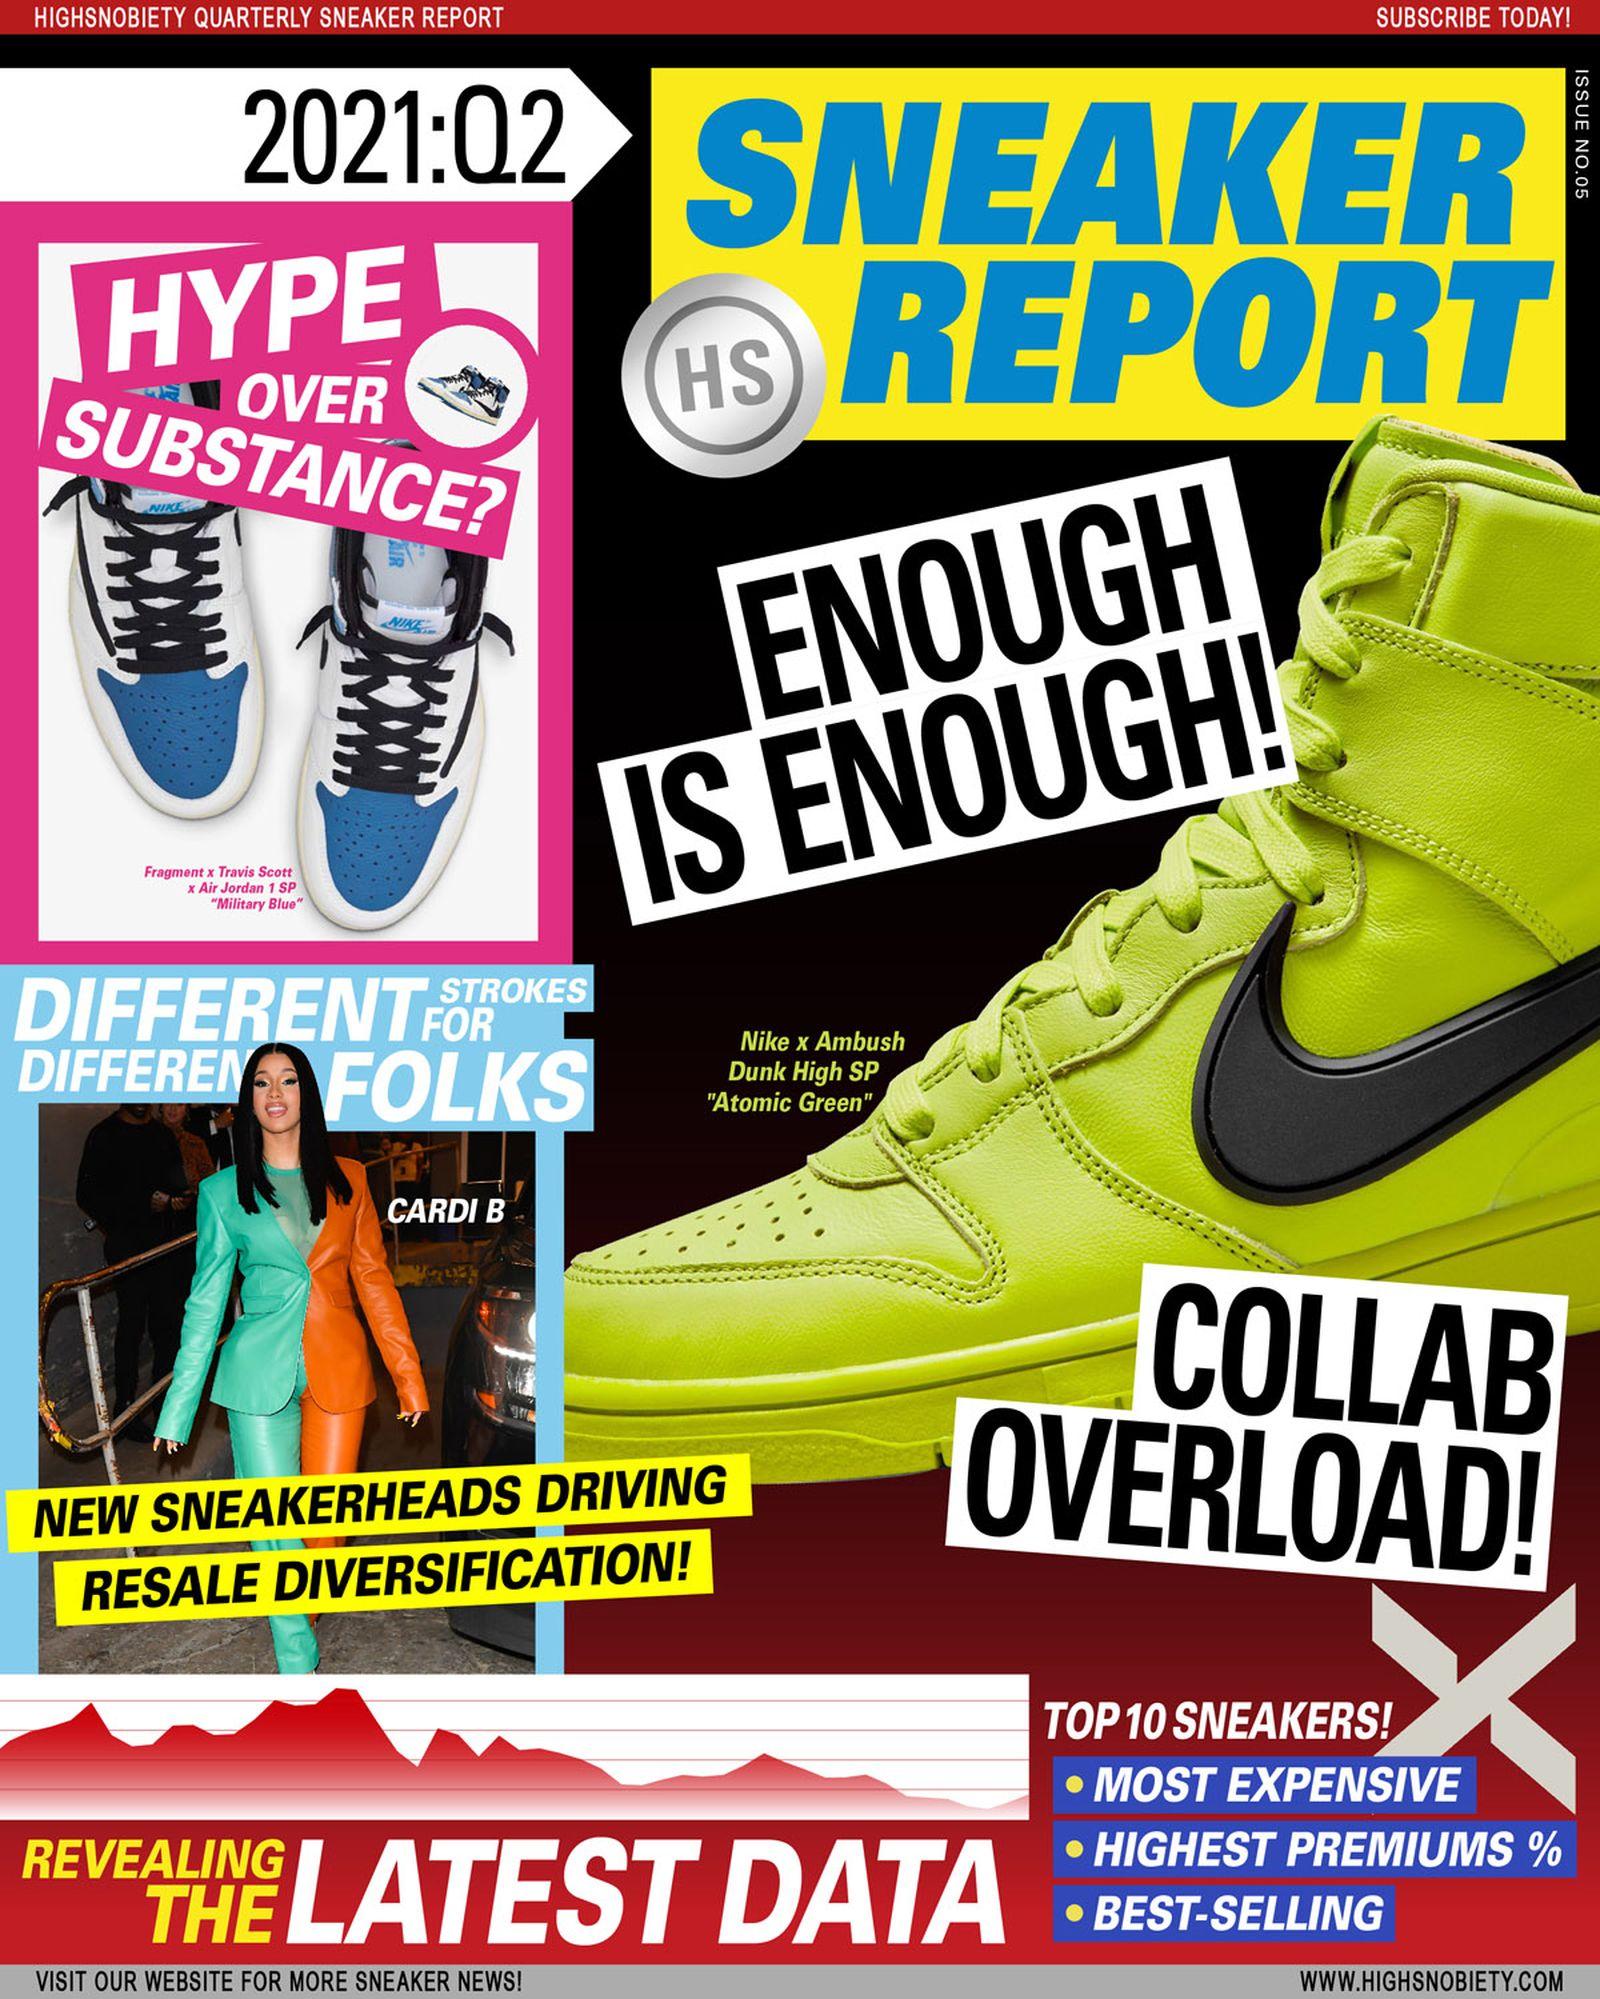 ED_SM_2021_Q2_Sneaker_Report_Cover_01